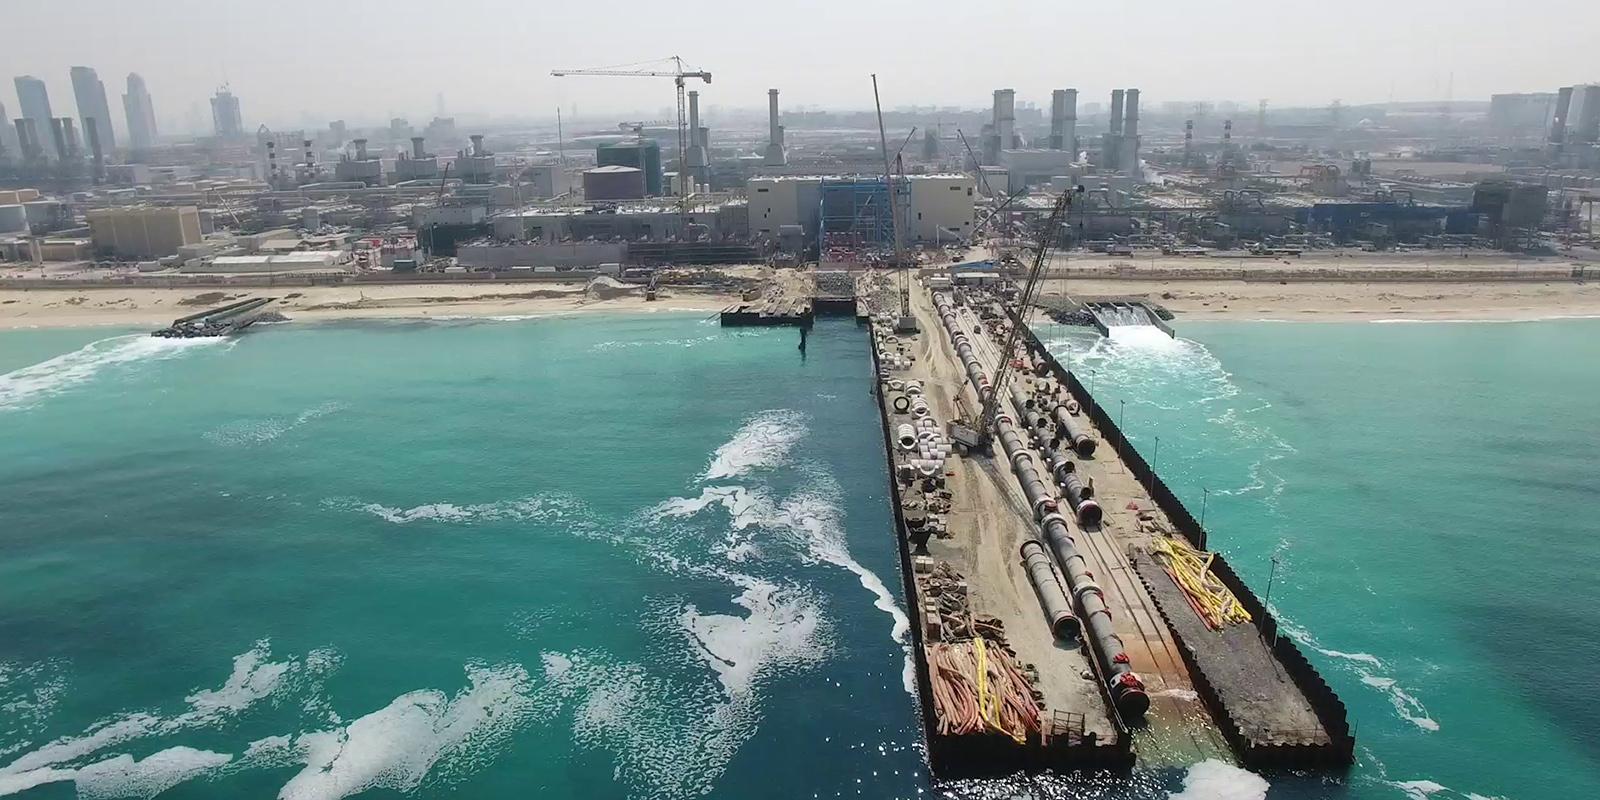 Desalination plant Jebel Ali